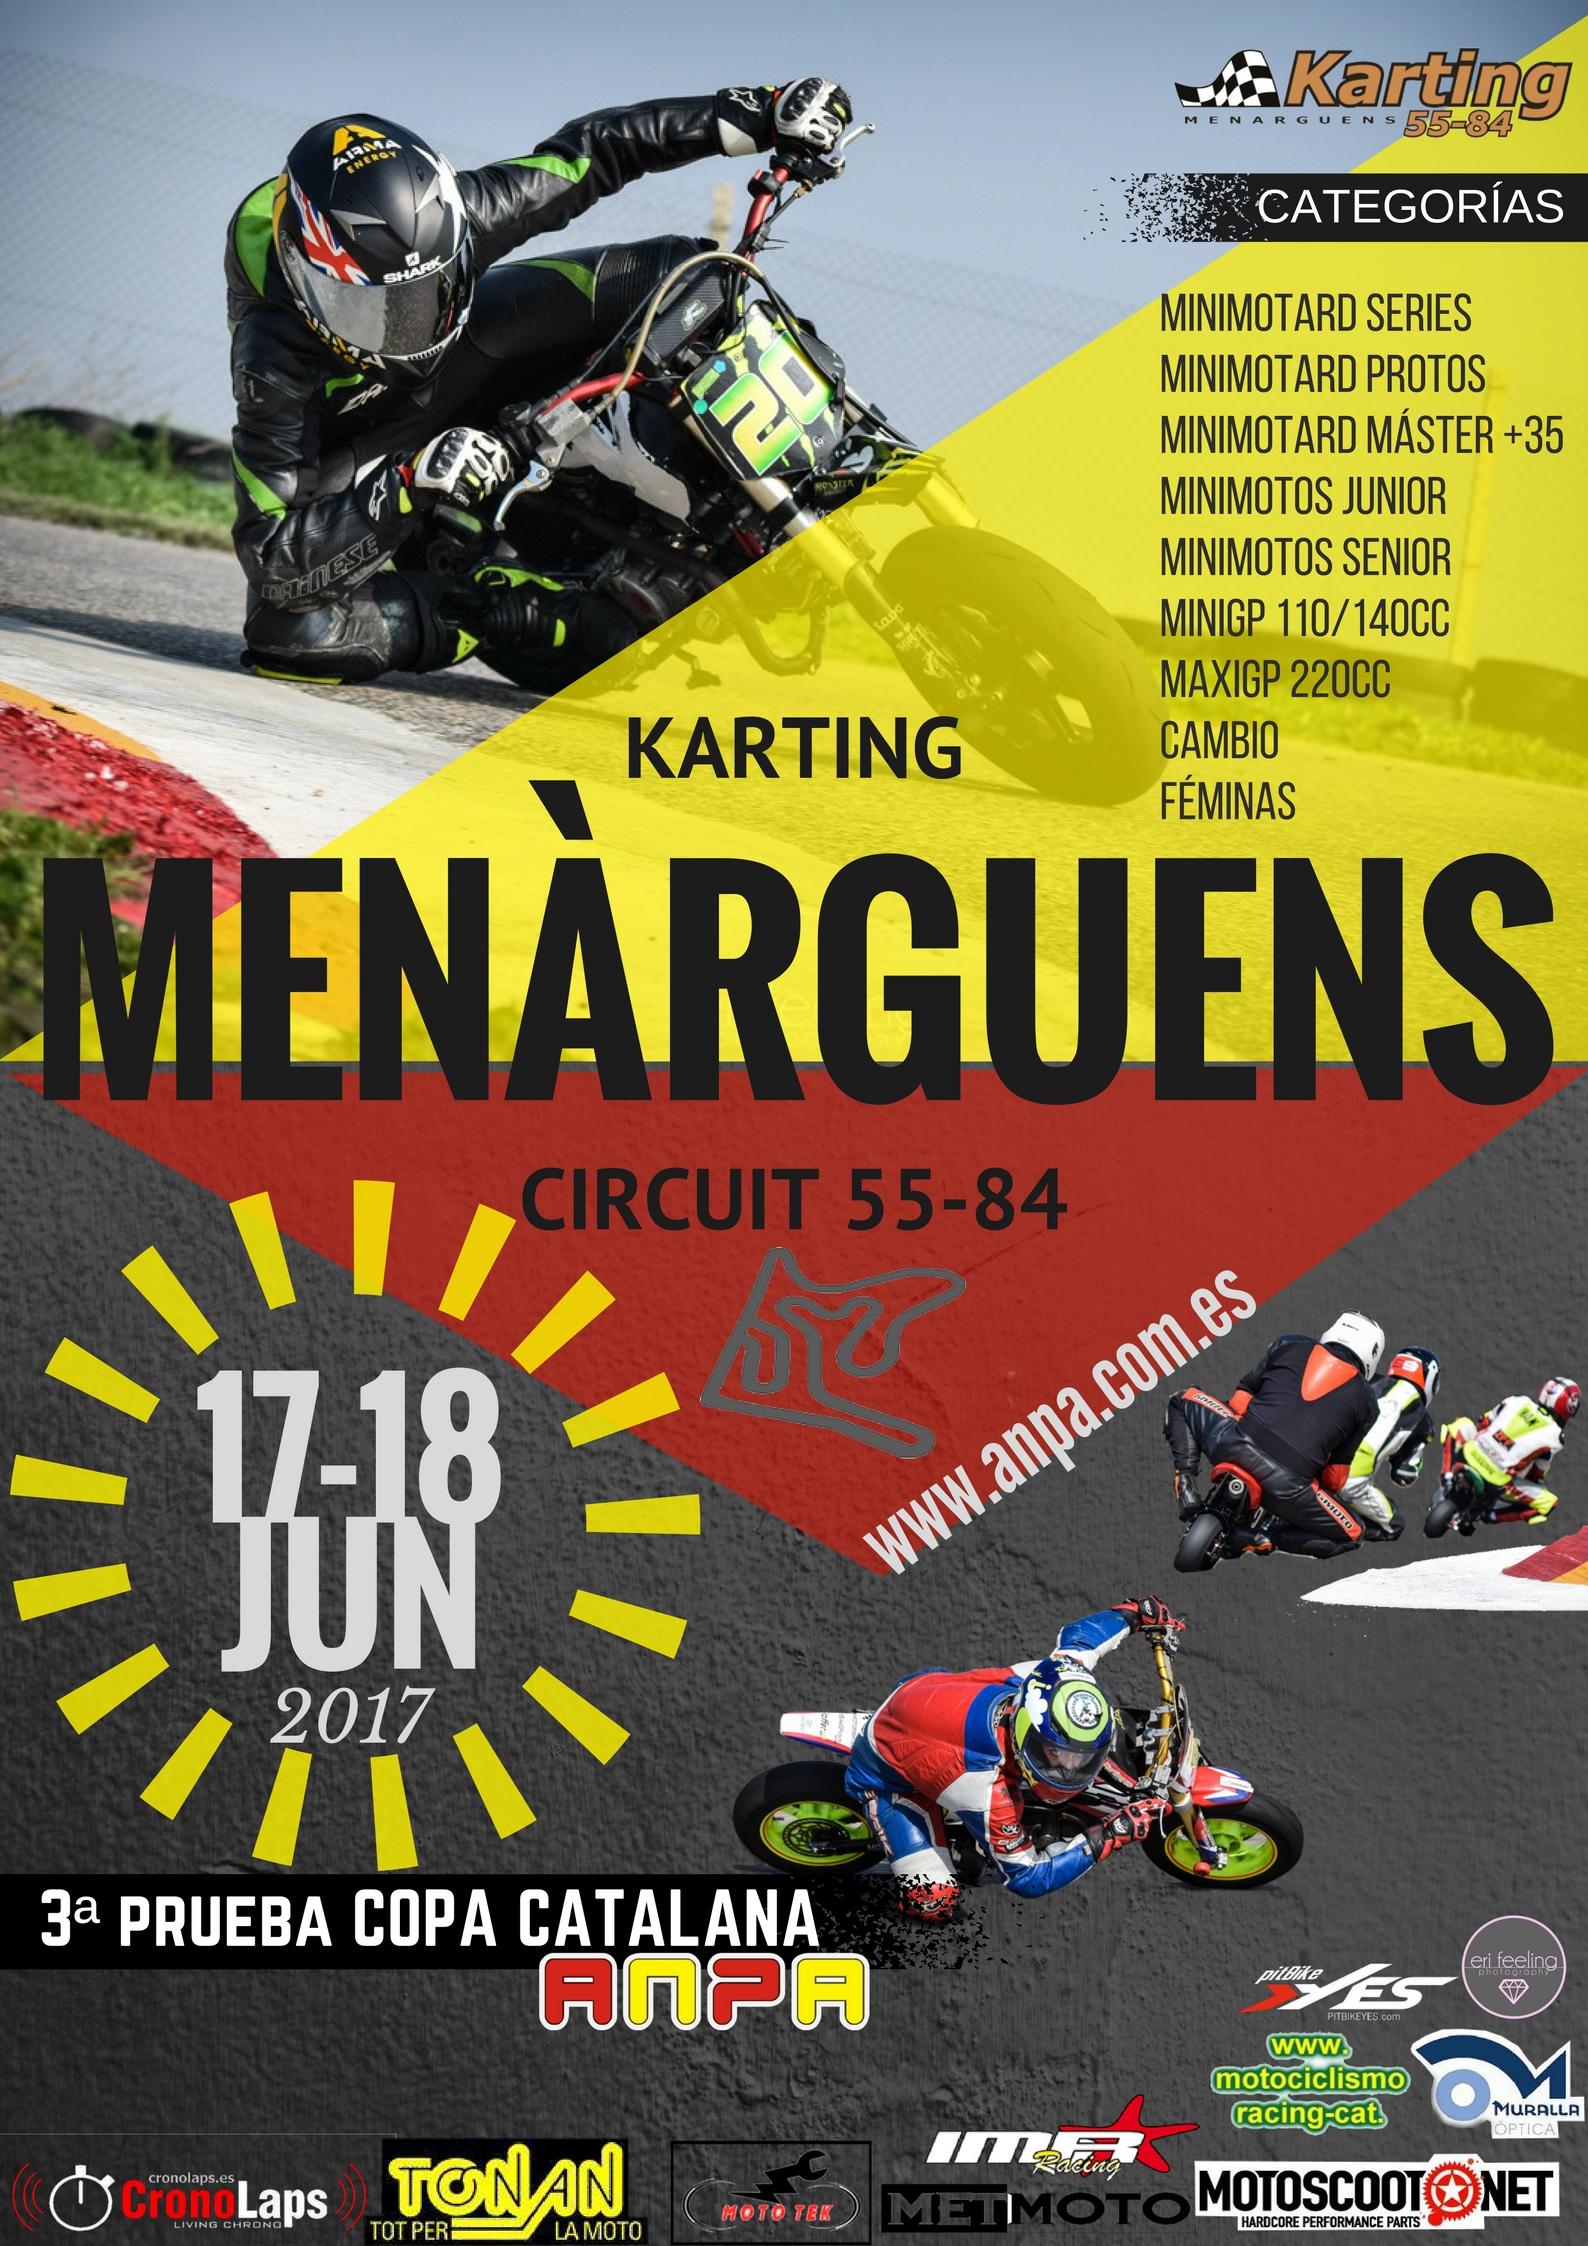 3ª Prueba Copa Catalana Circuito Menarguens 3ª Prueba Copa Catalana Circuito Menarguens Copa Catalana 17 - 18 junio 2017